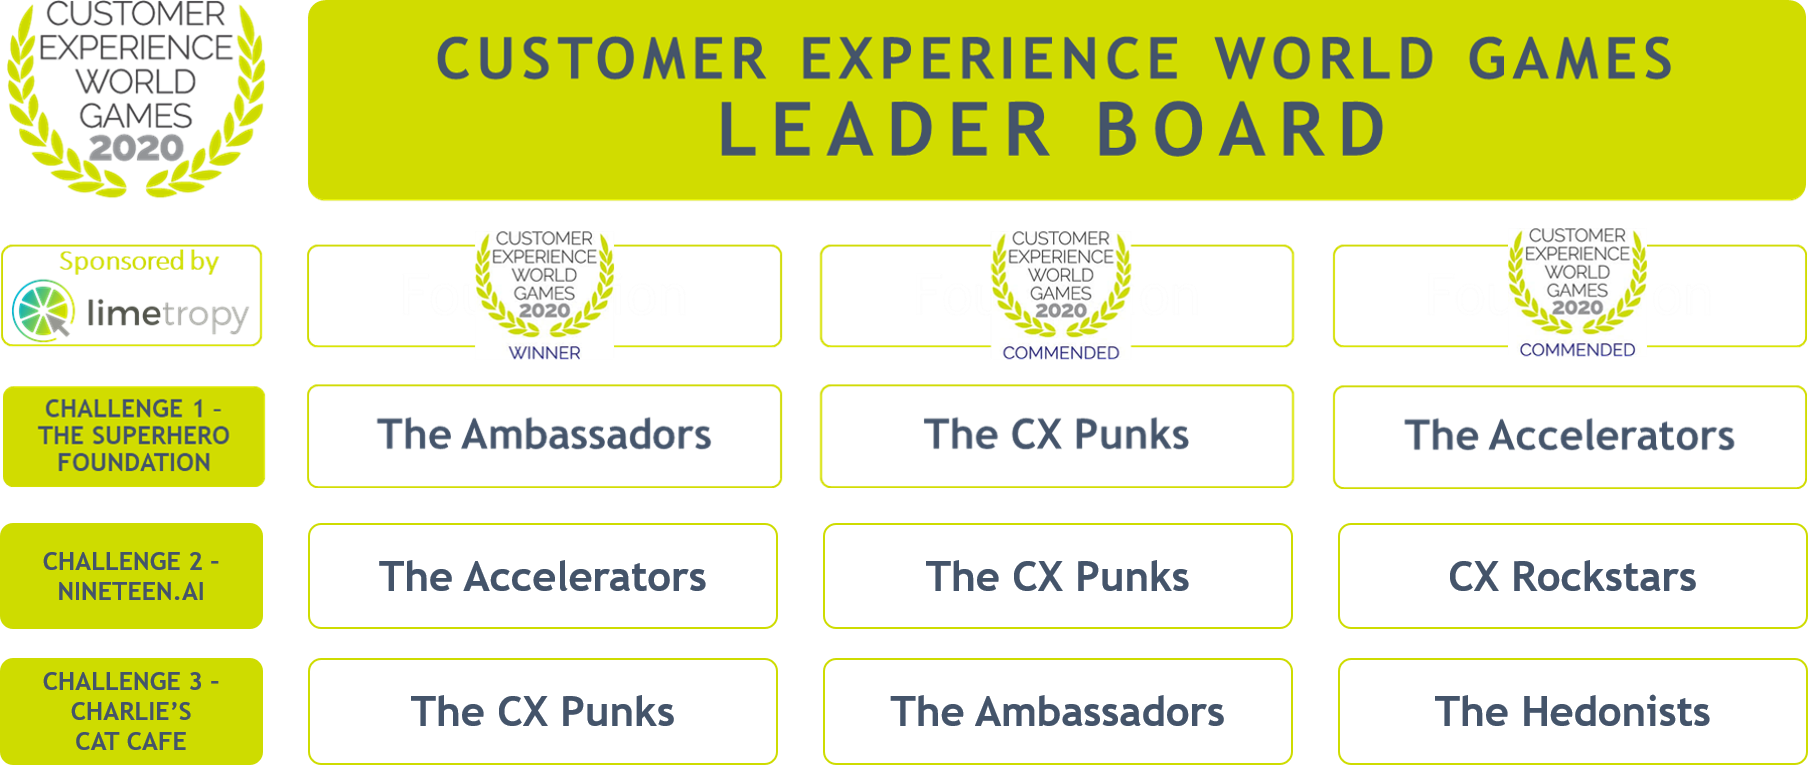 CXWG20 - Challenge 3 leaderboard